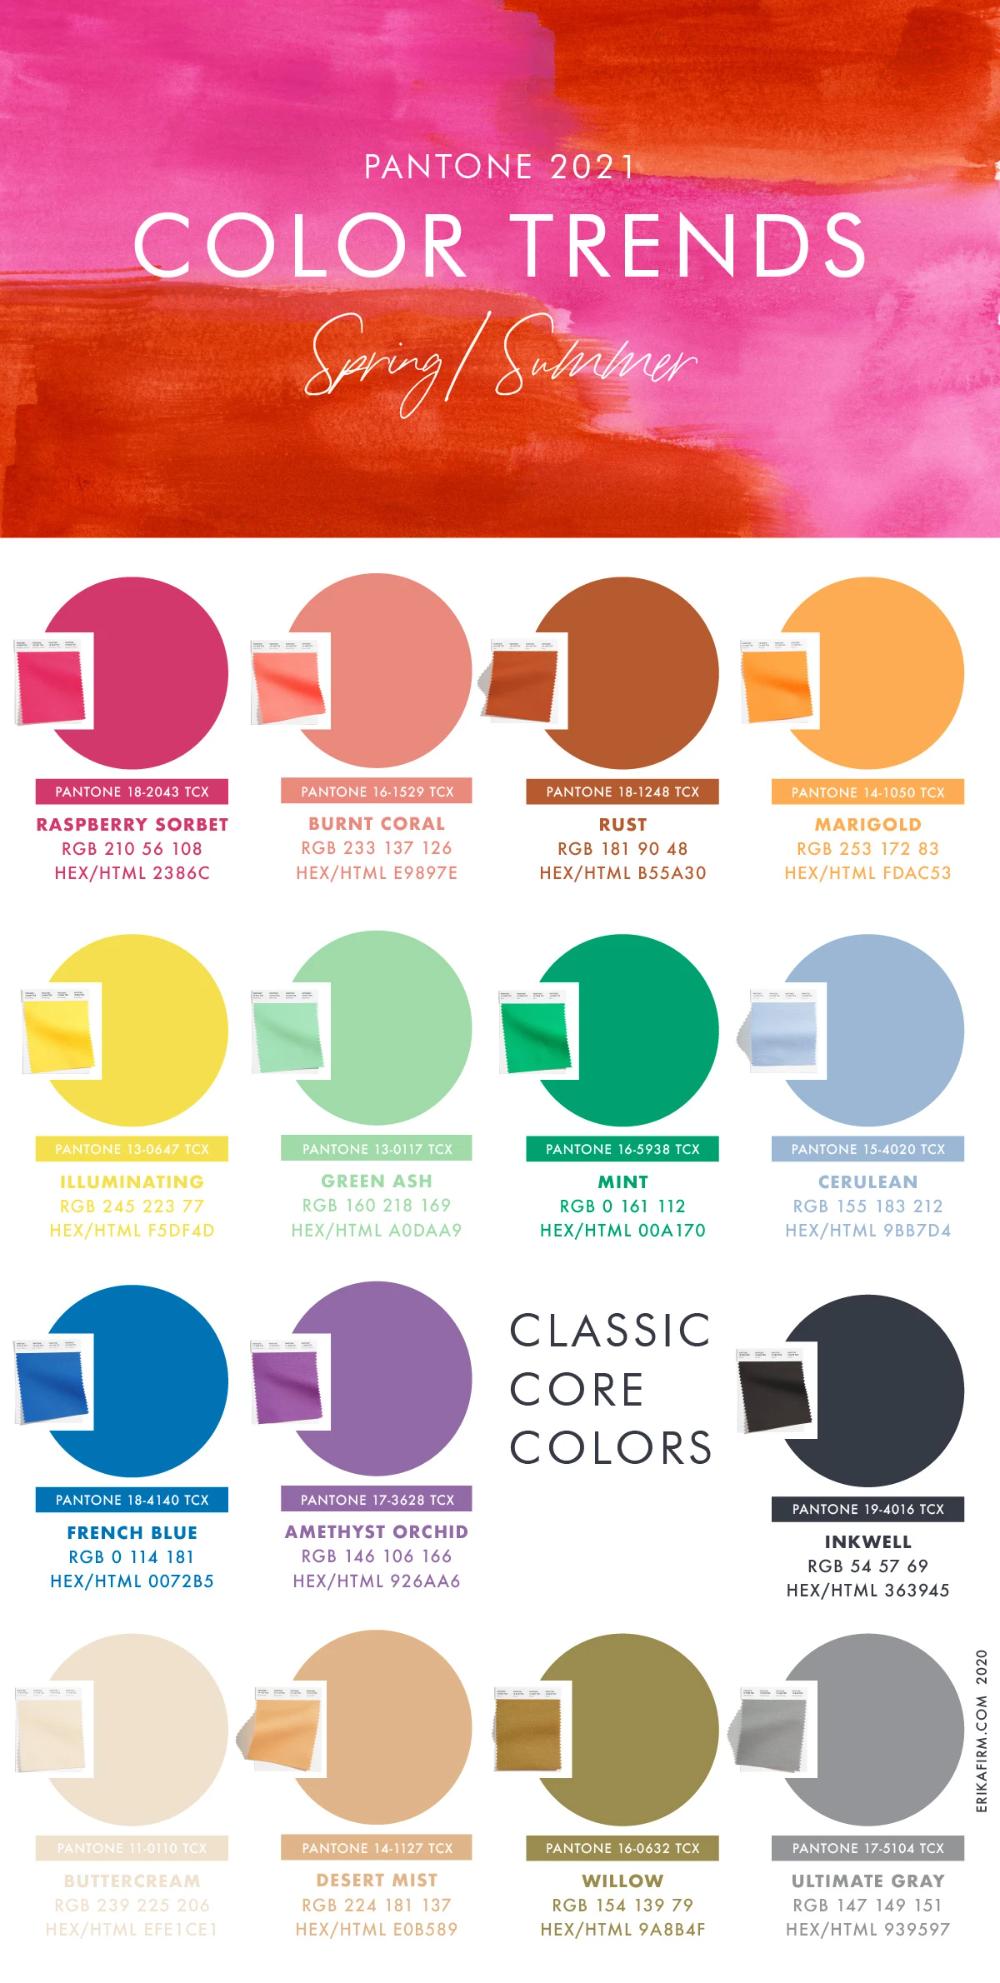 Spring Summer 7 Pantone Color Trends  Color trends, Summer